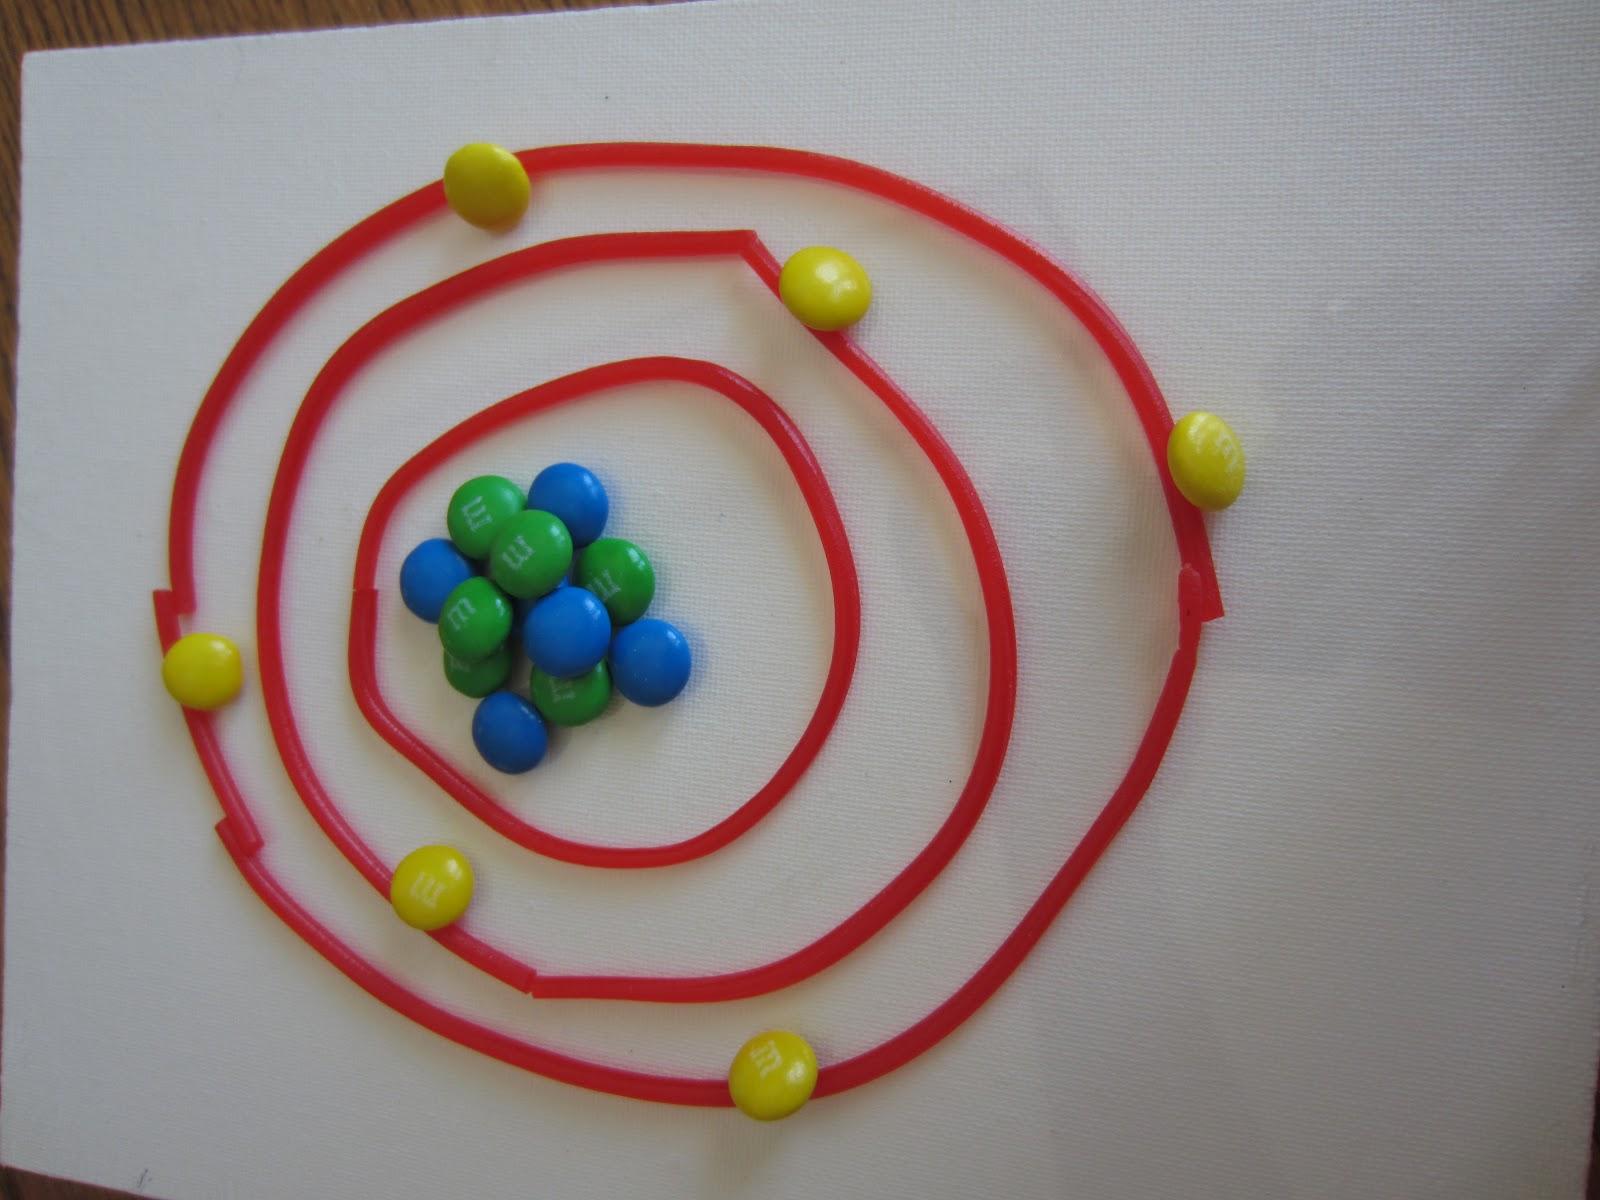 Online Chem Class 2012 Activity 2